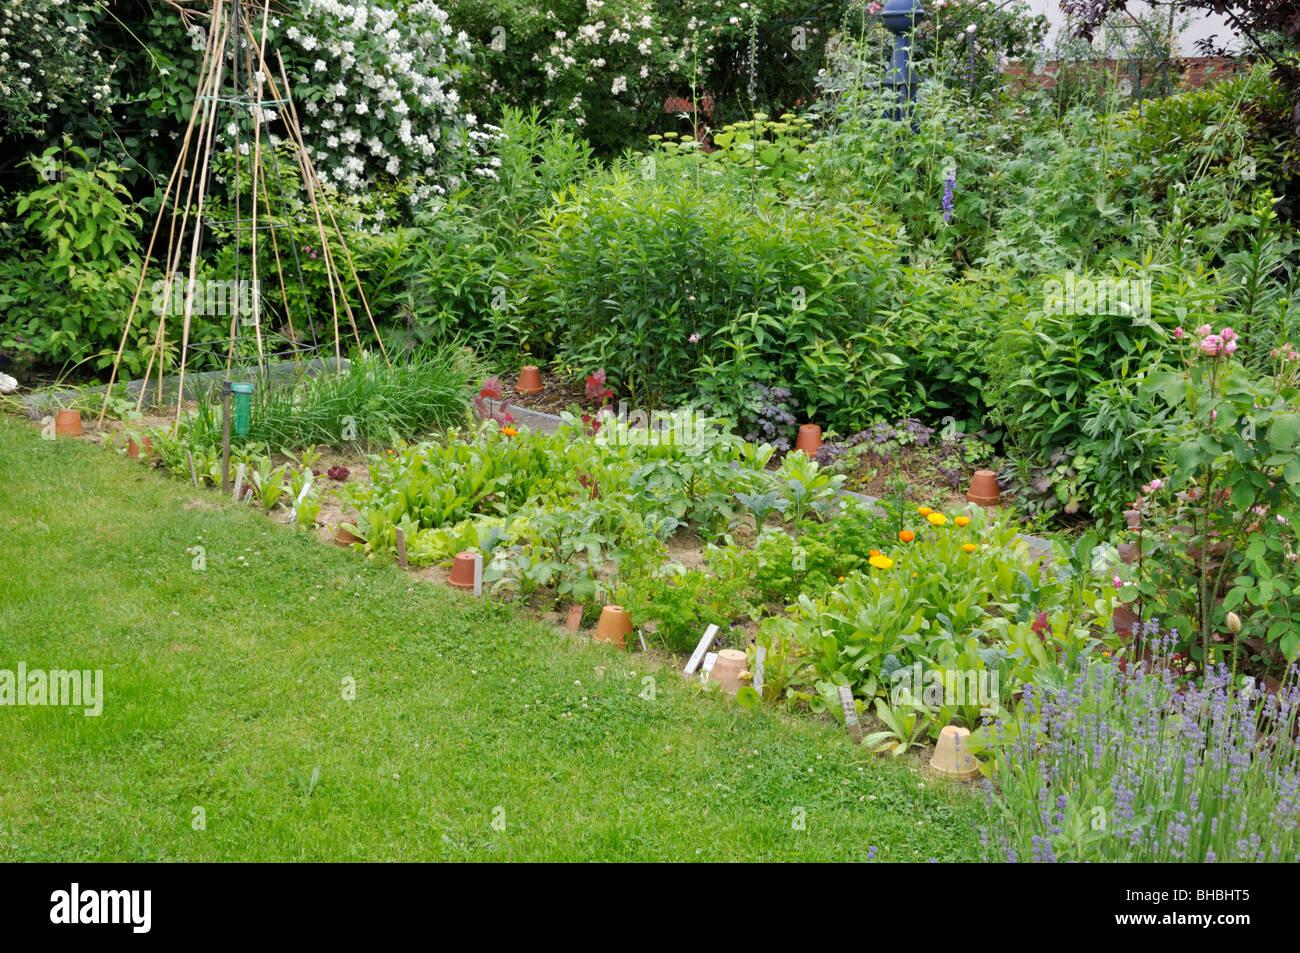 Vegetable garden - Stock Image